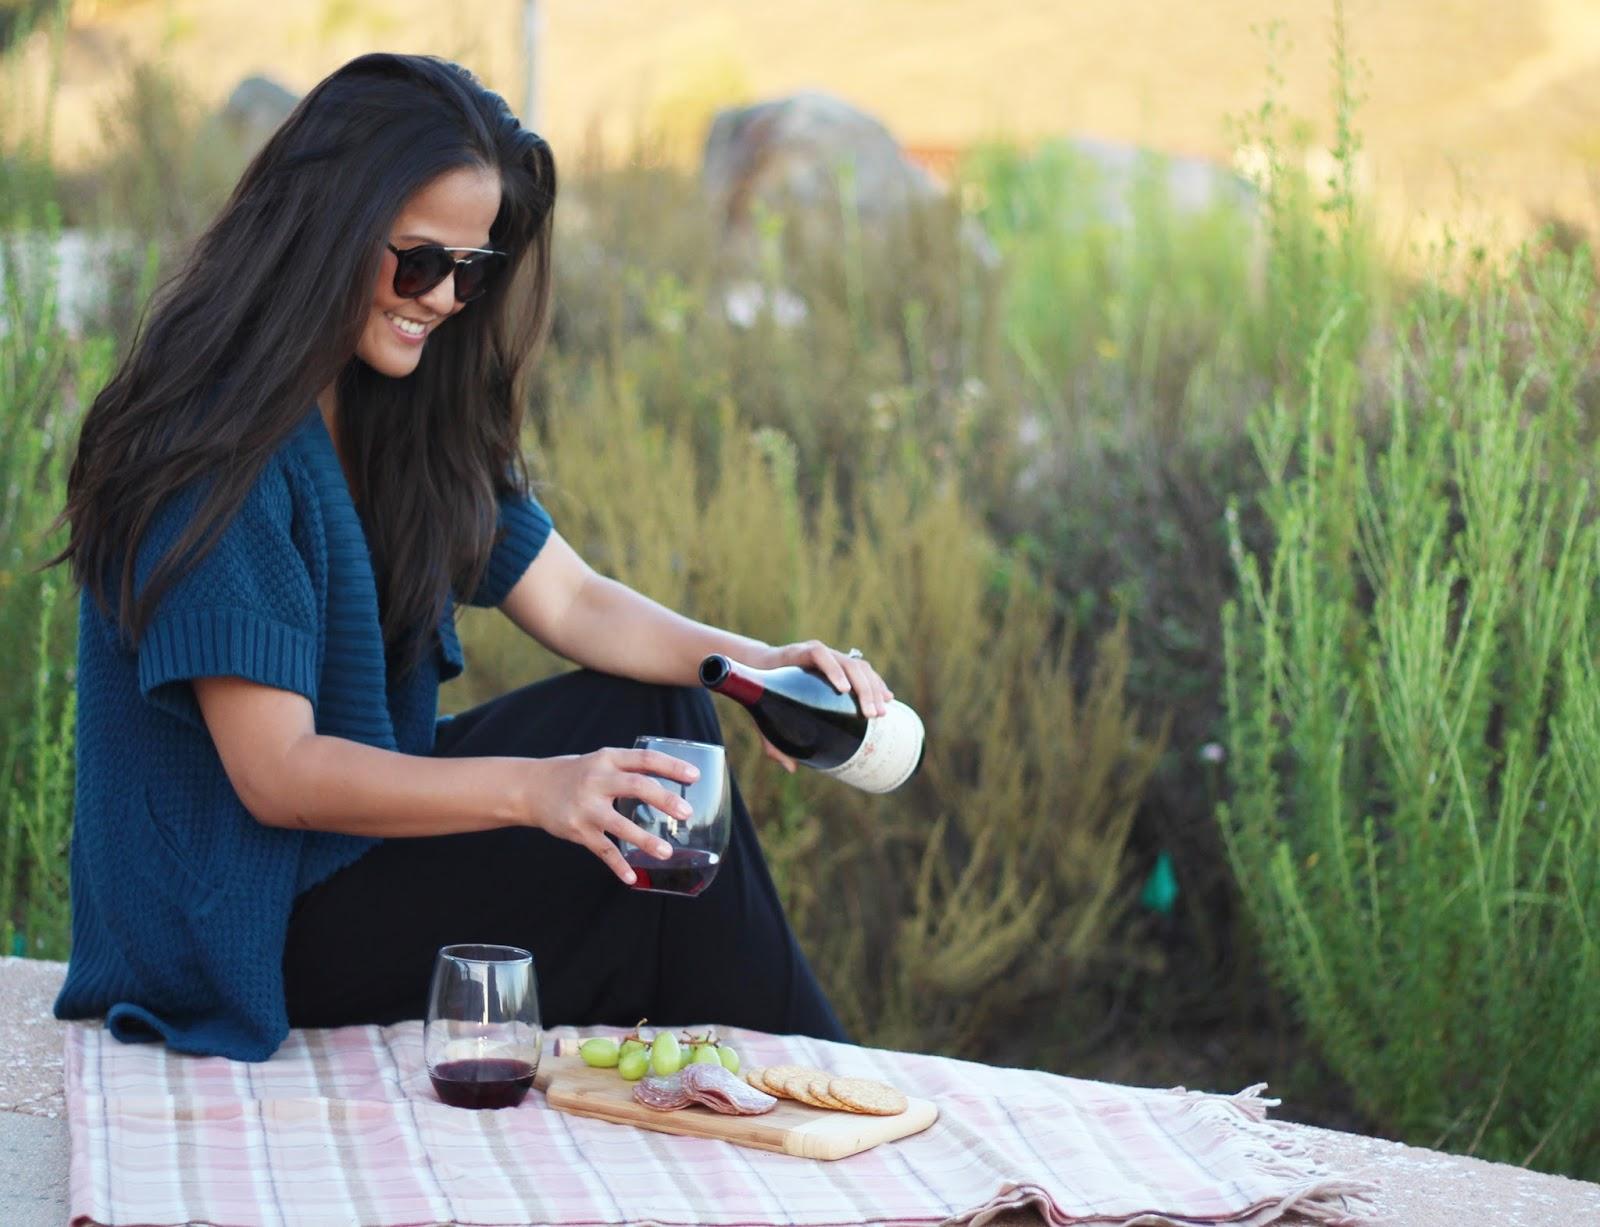 Wine Wednesday: Burgundy Pinot Noir {& a fun Giveaway!}